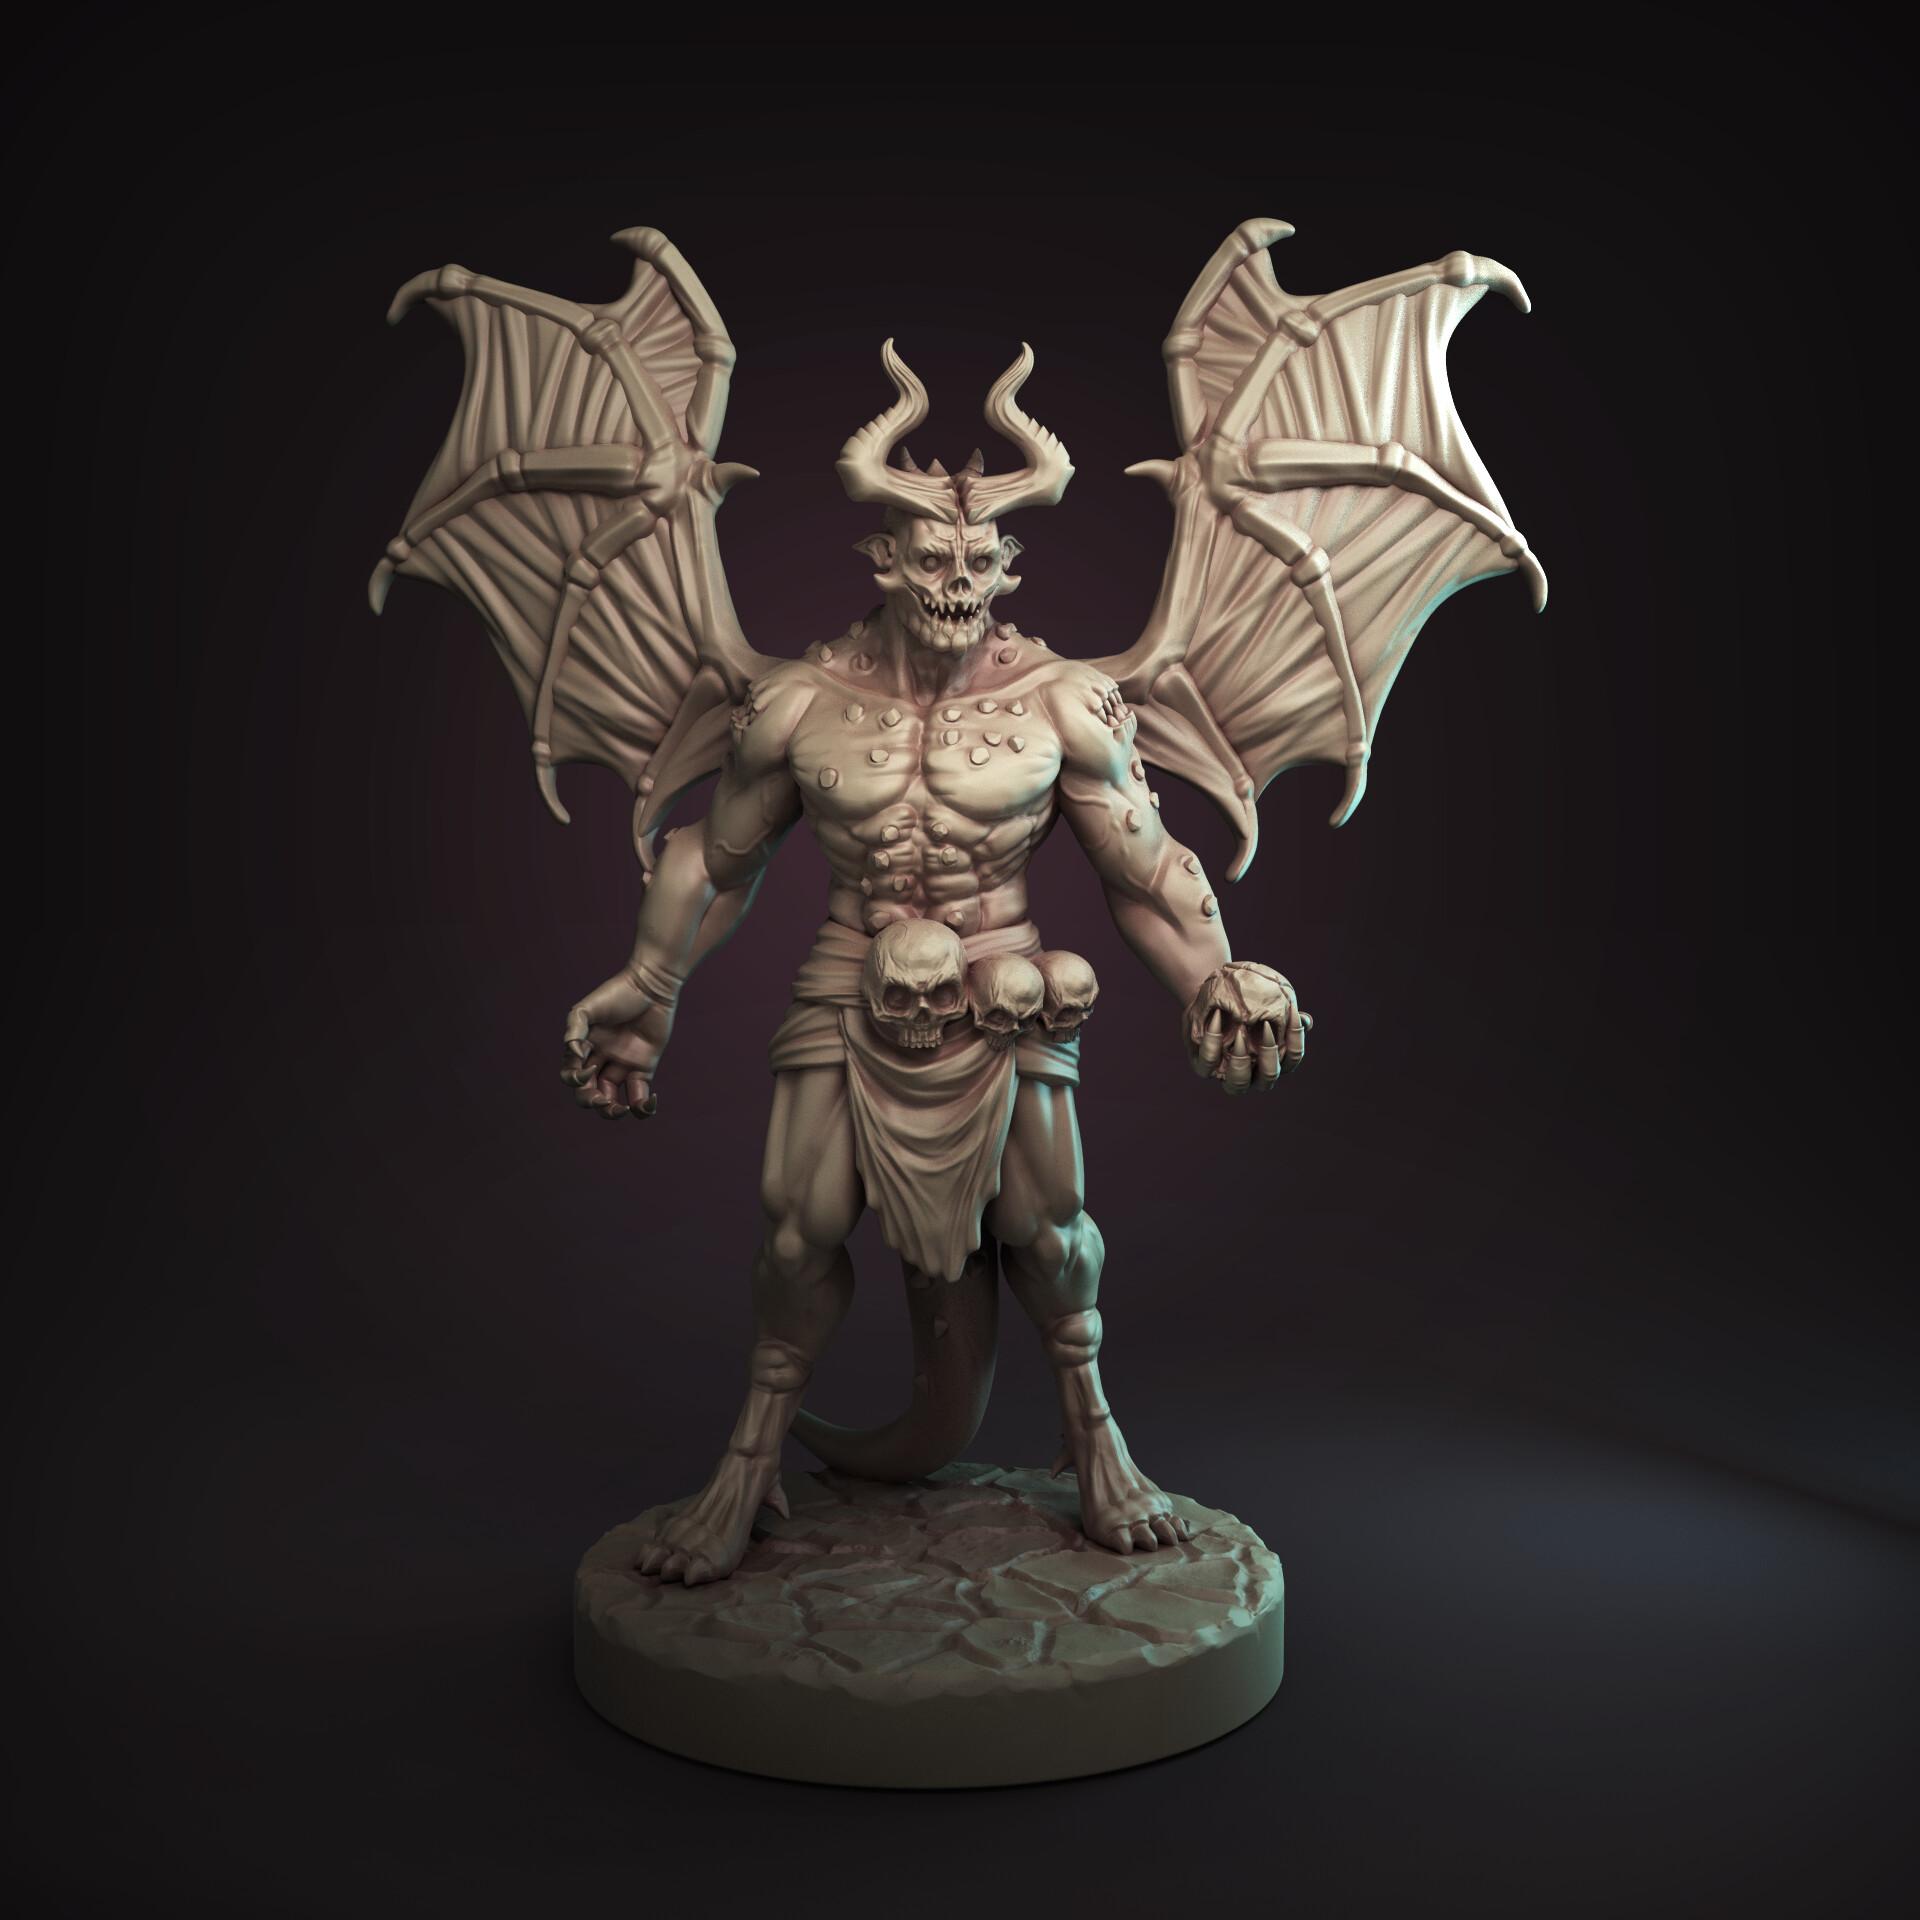 Artem bespalov demon 01